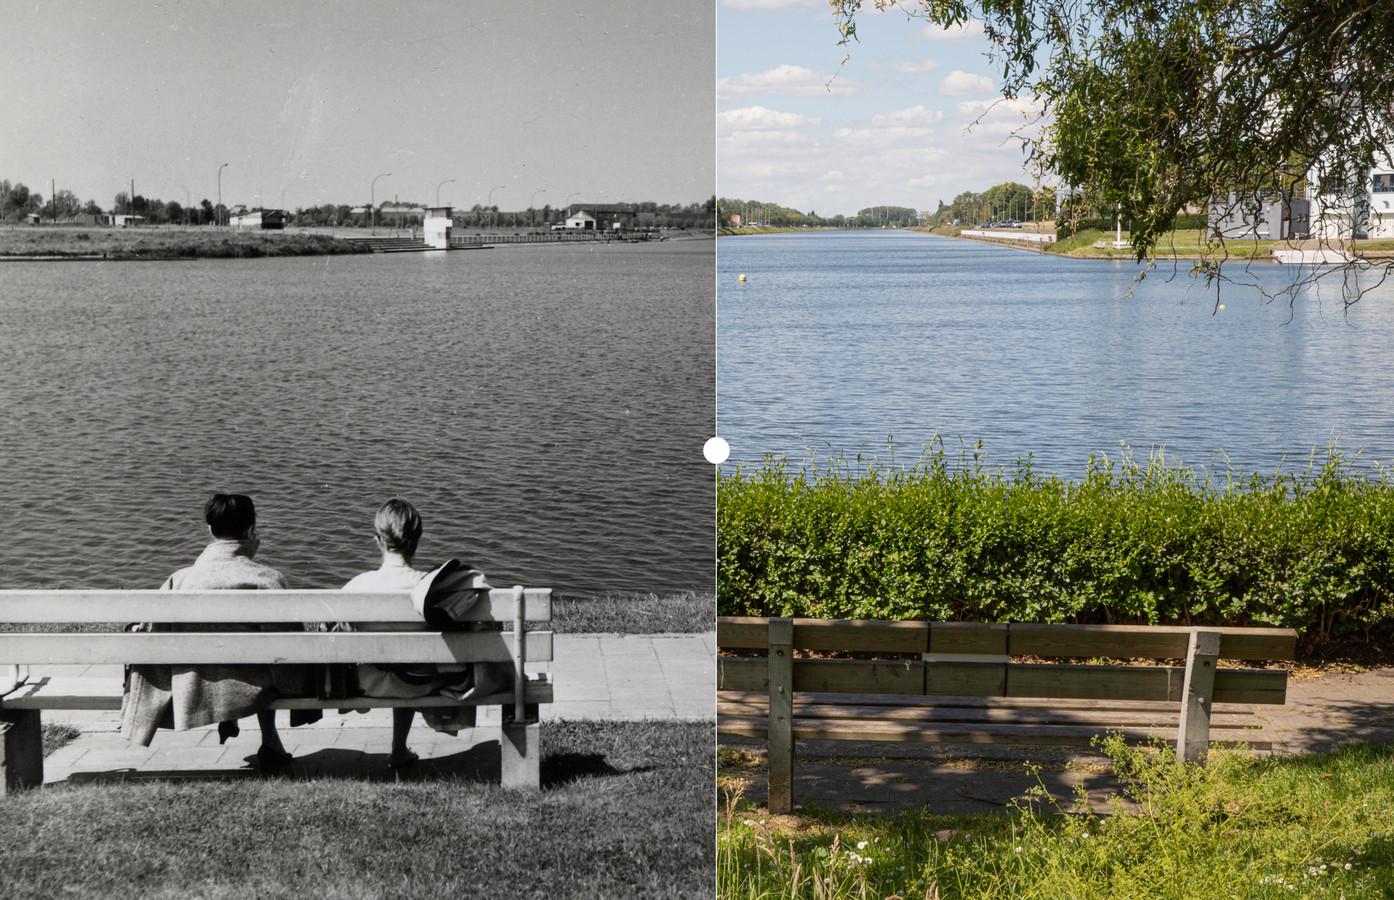 De Watersportbaan vroeger en nu.